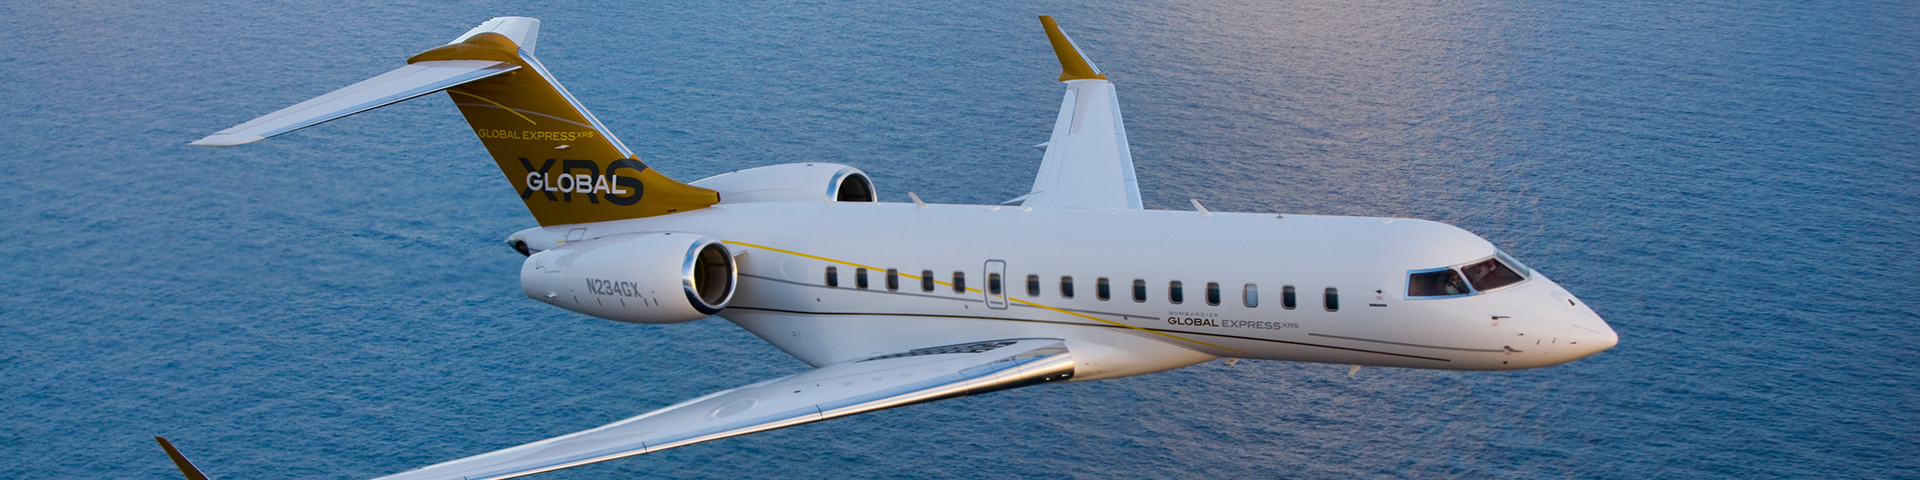 Global Express Exterior 11 - Global Express Private Jet